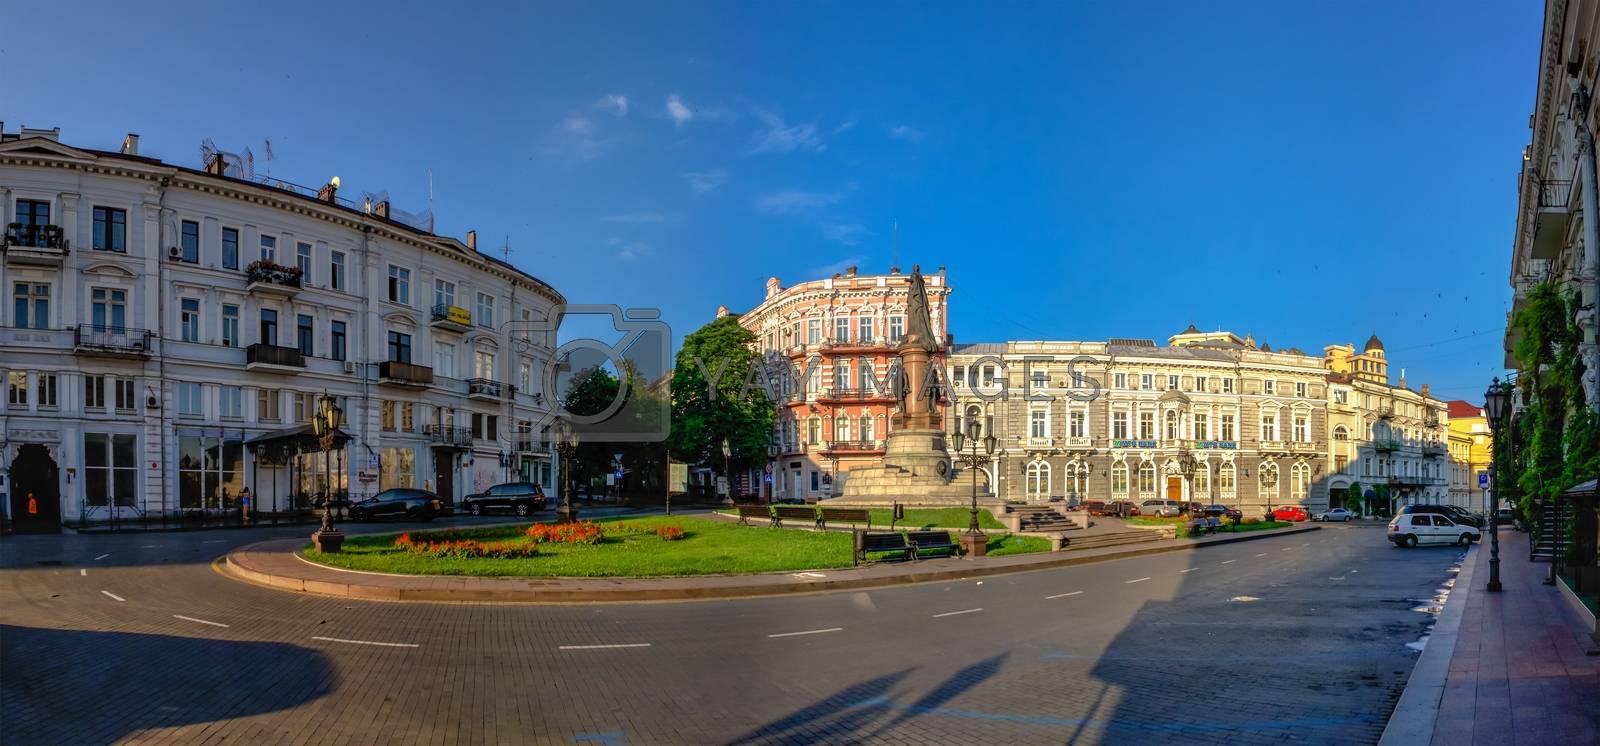 Odessa, Ukraine 06.30.2020. Ekaterininskaya Square in the historical center of Odessa, Ukraine, on a sunny summer morning